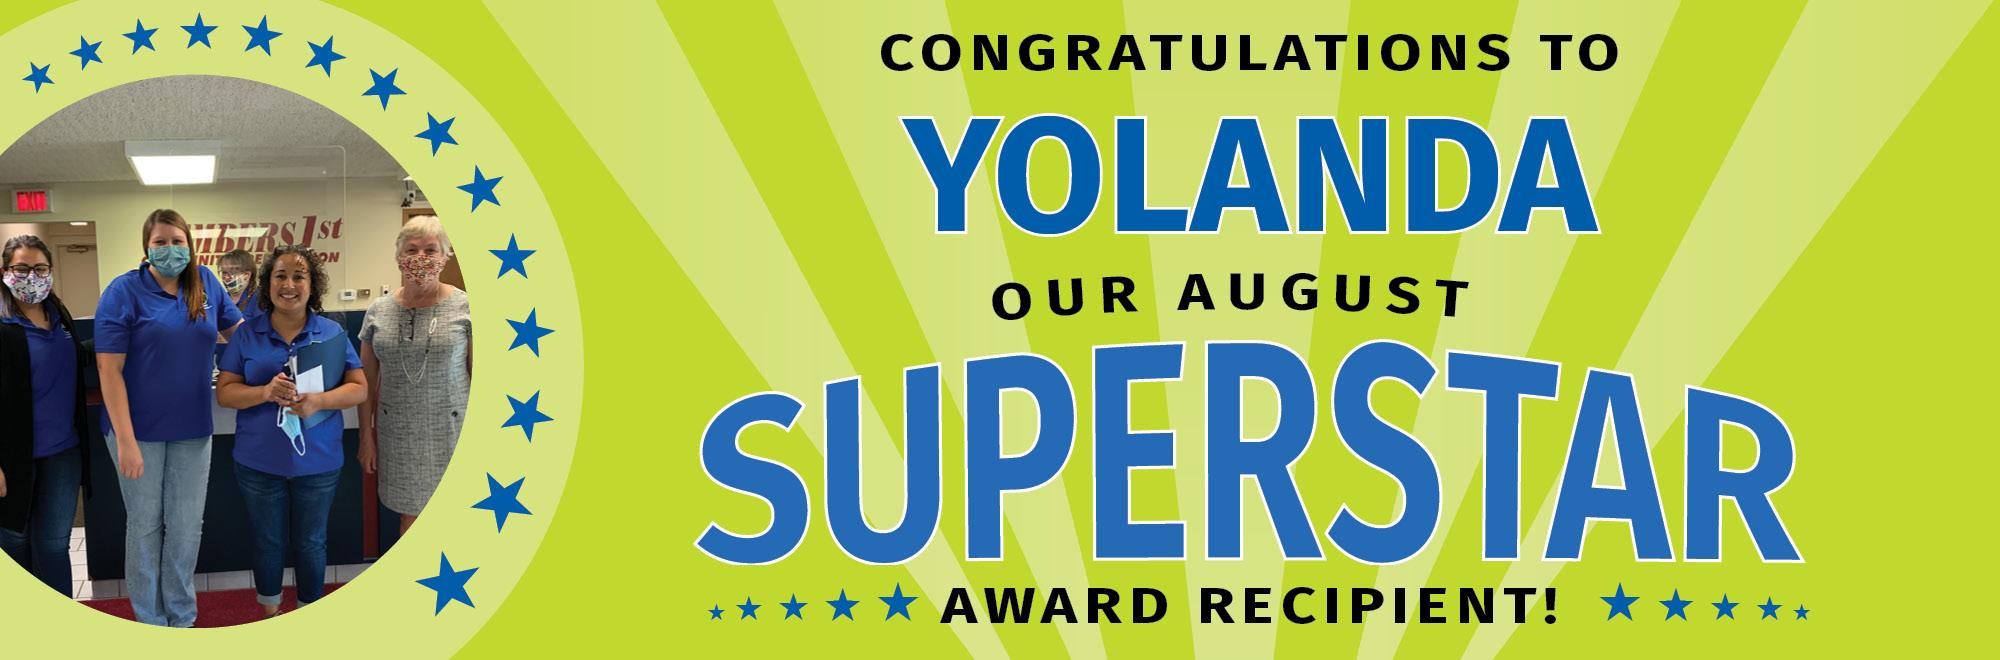 Congratulations to Yolanda, our August Super Star!